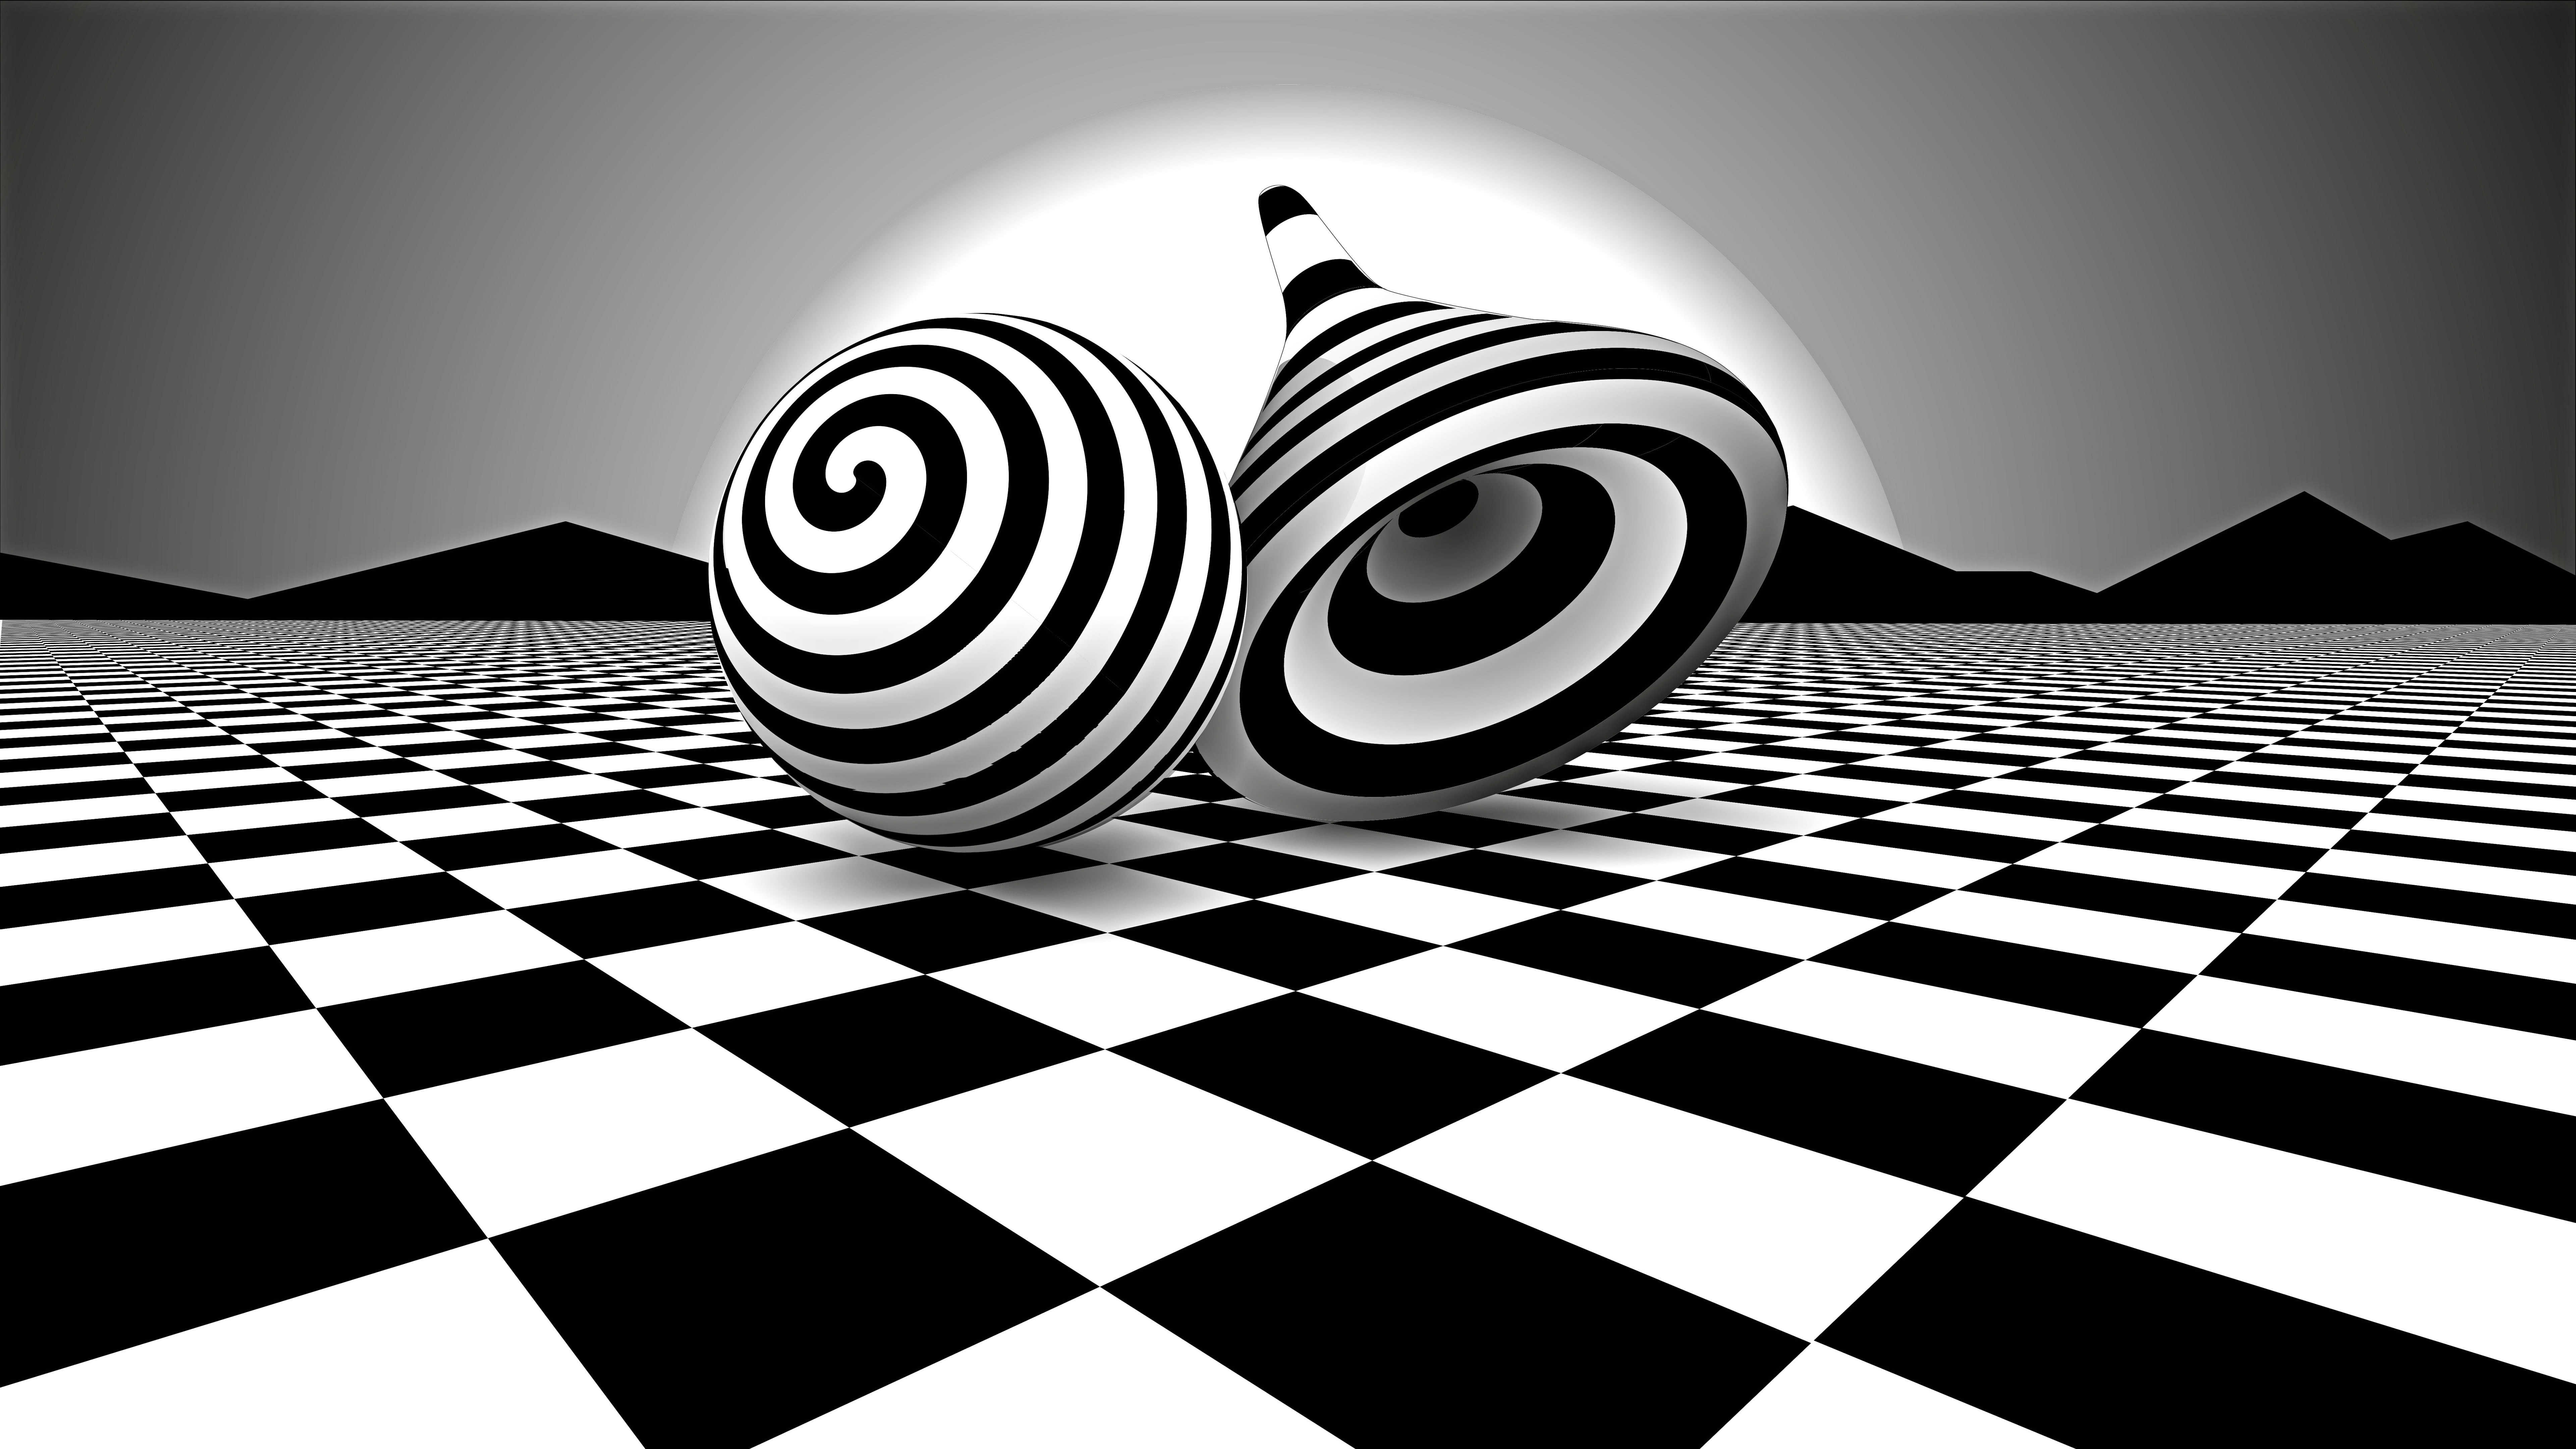 black and white optical illusion uhd 8k wallpaper